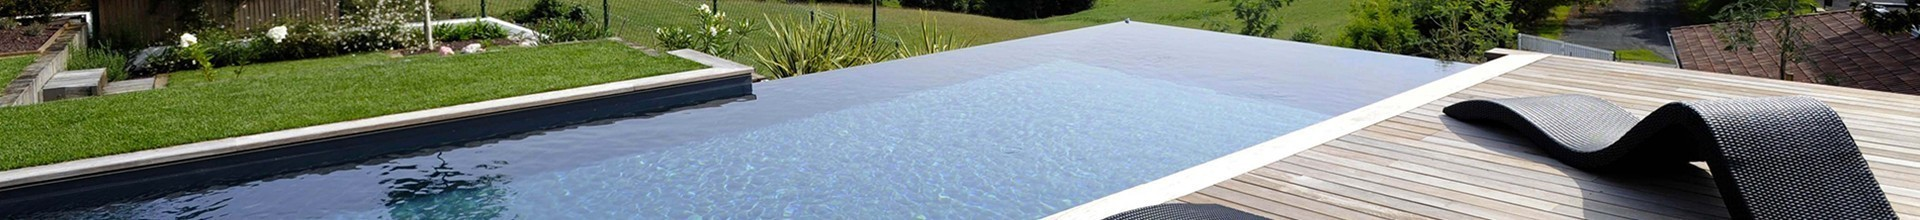 Direct usine, piscine coque prix Lozère